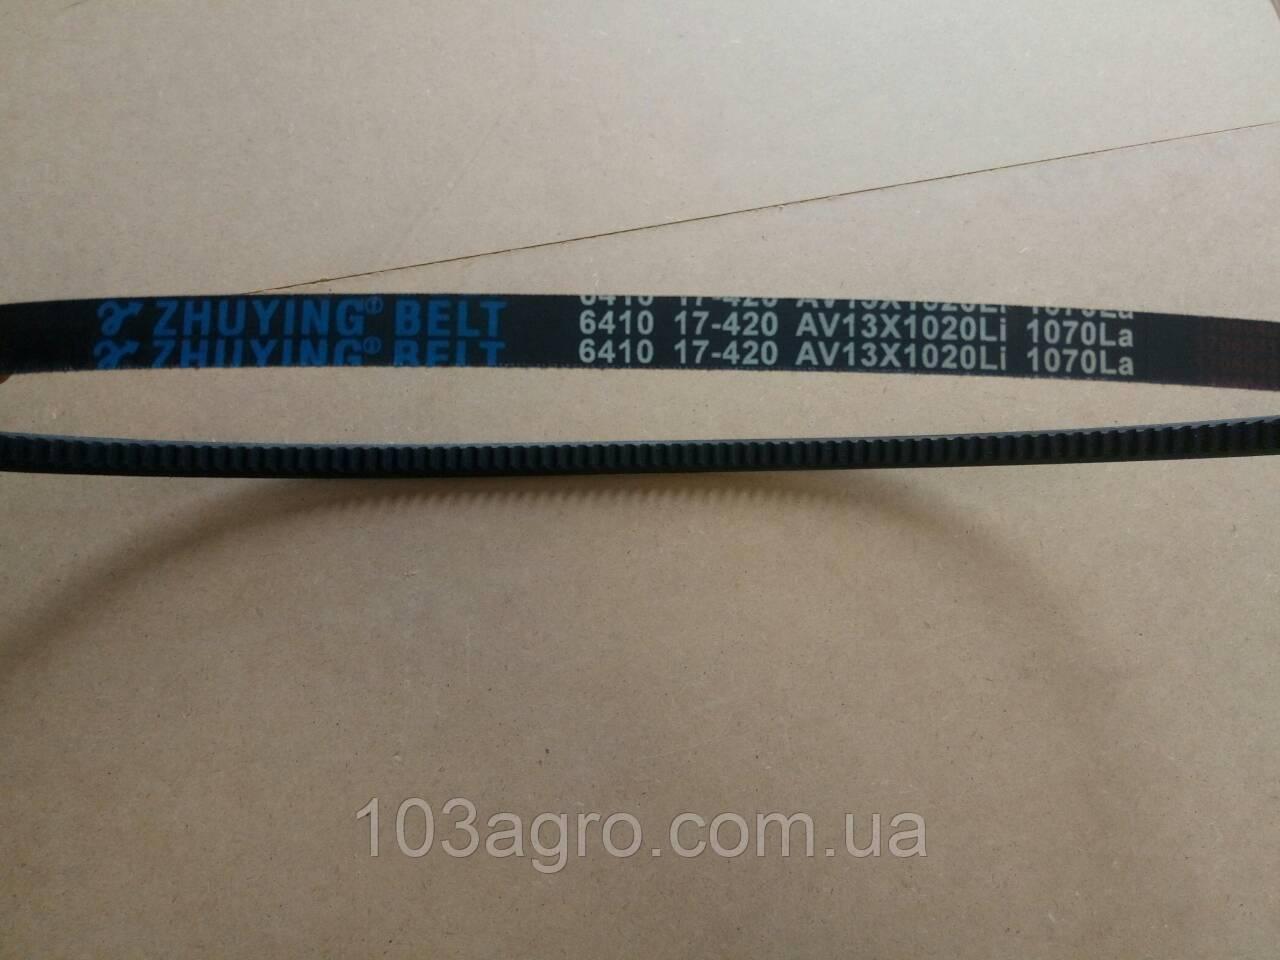 Ремінь генератора AV13x1070La Dong Feng 240/244/250/254